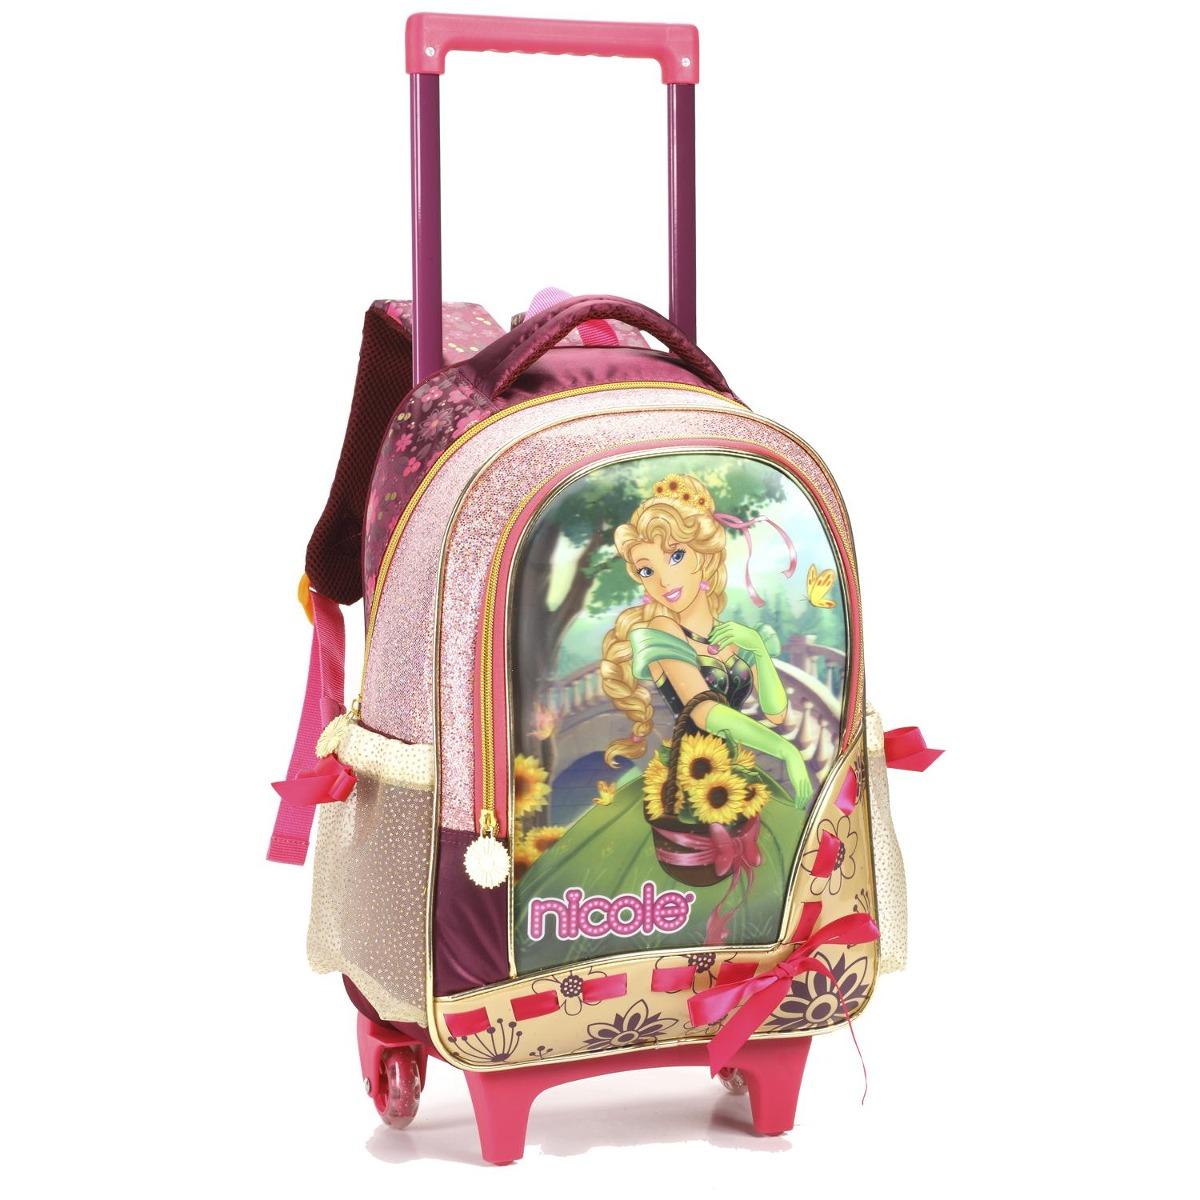 17ed5fc72 Mochila Carrinho Infantil Feminina Princesa 11643 - R$ 148,40 em ...